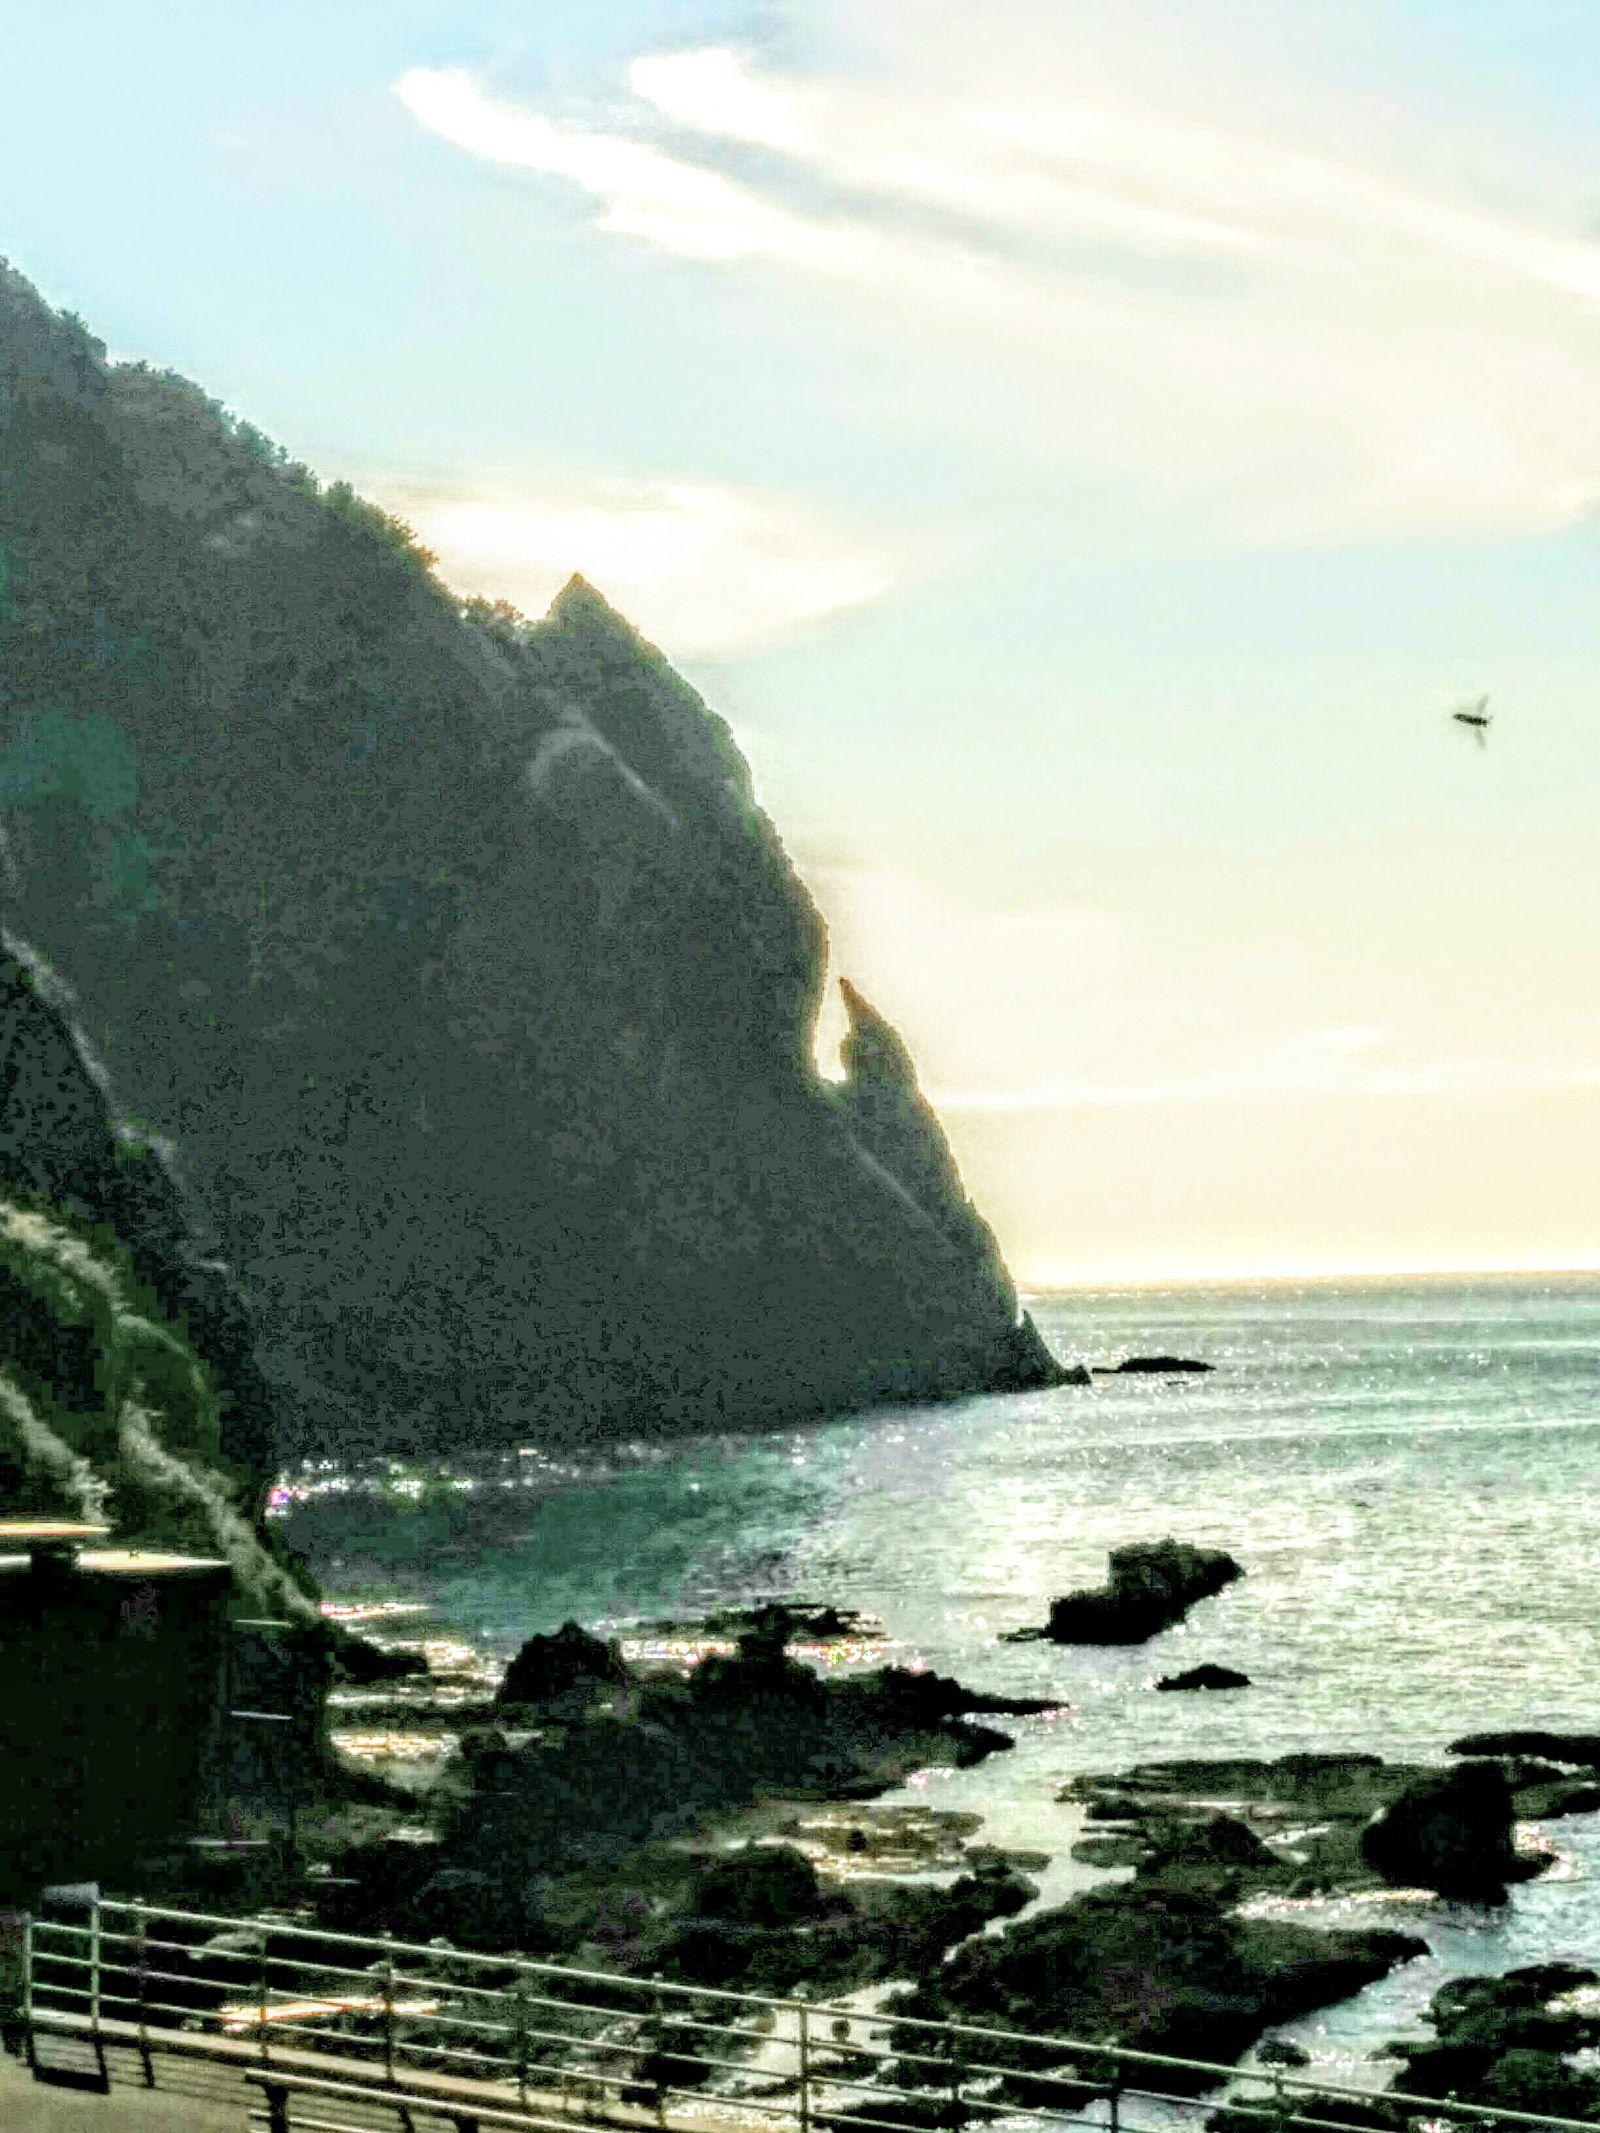 岩内町雷電岬「刀掛岩」観光案内です。